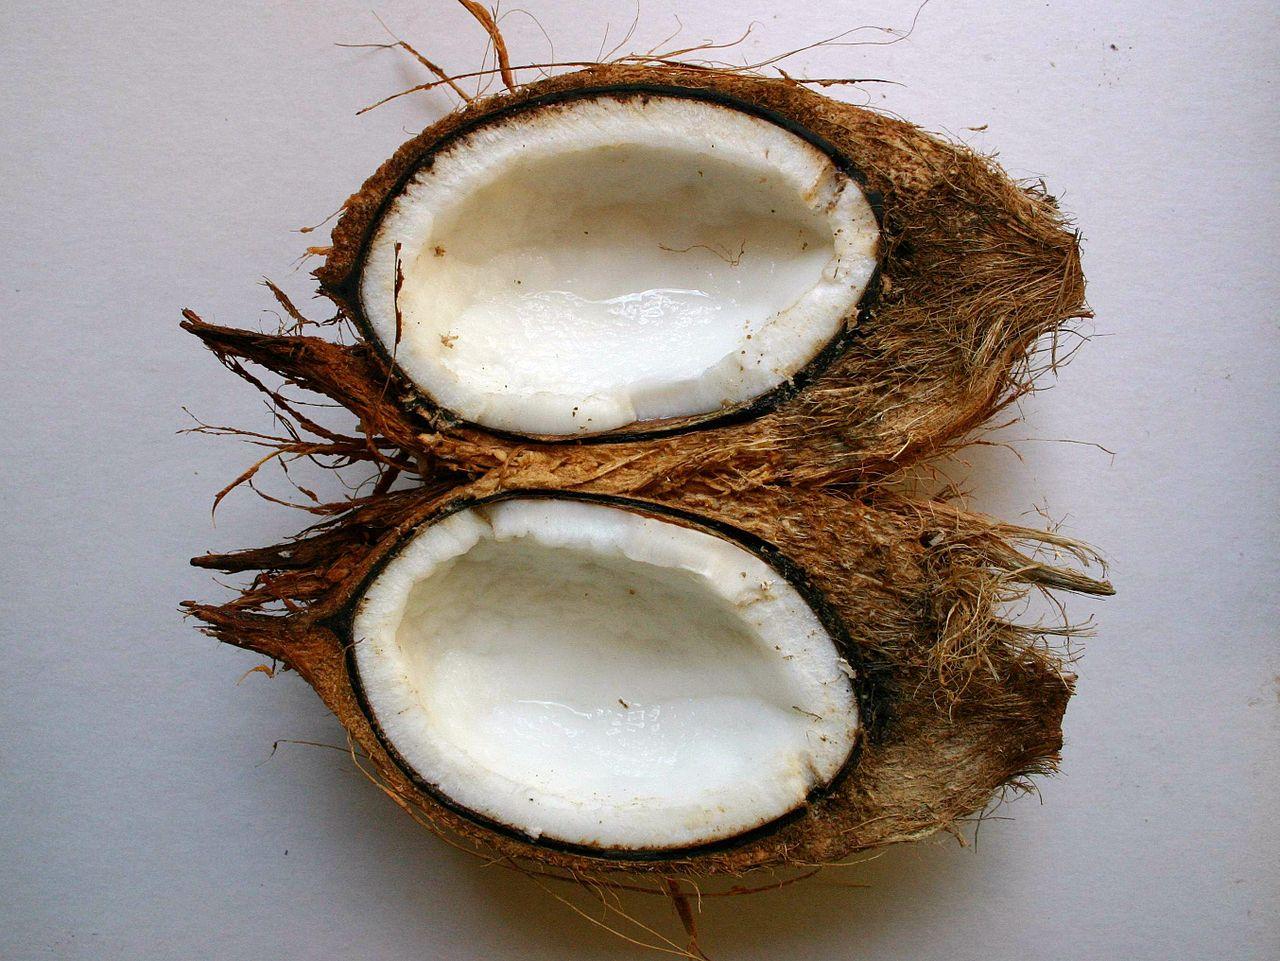 Kokosovník orechoplodý (Cocos nucifera) - plod